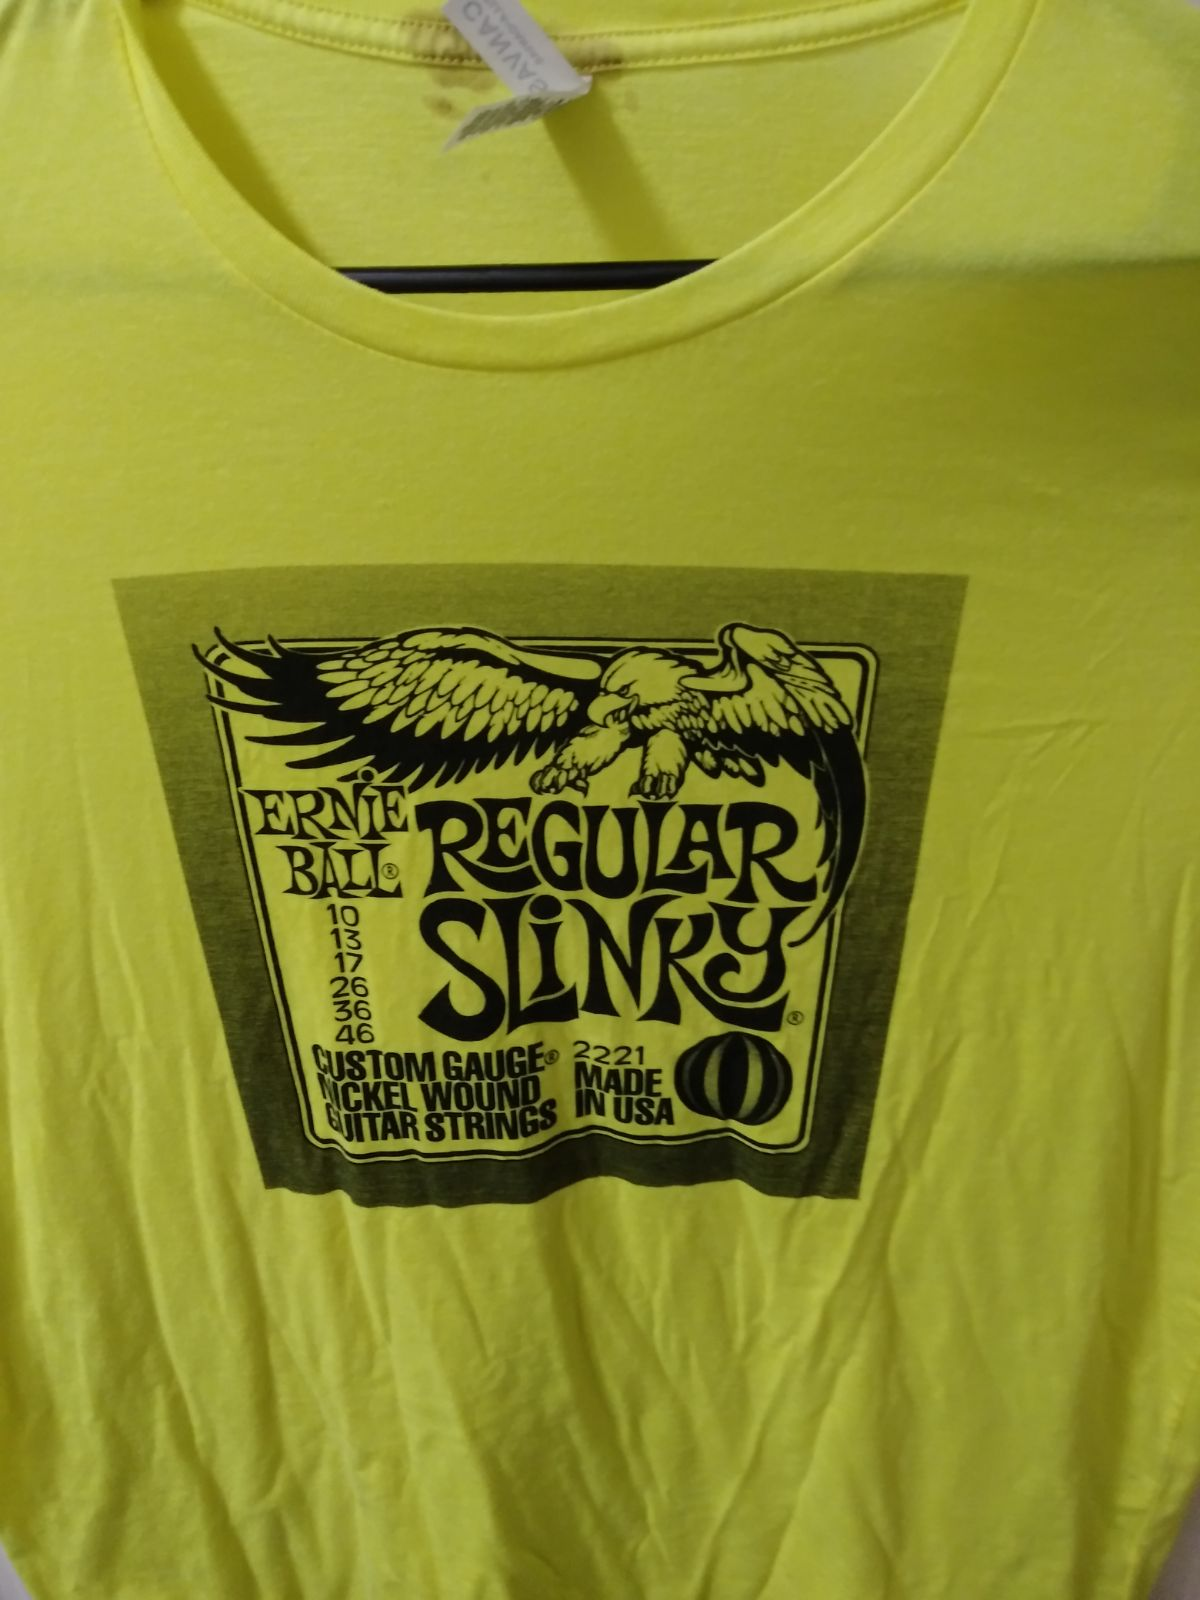 Ernie Ball Guitar Strings Tshirt